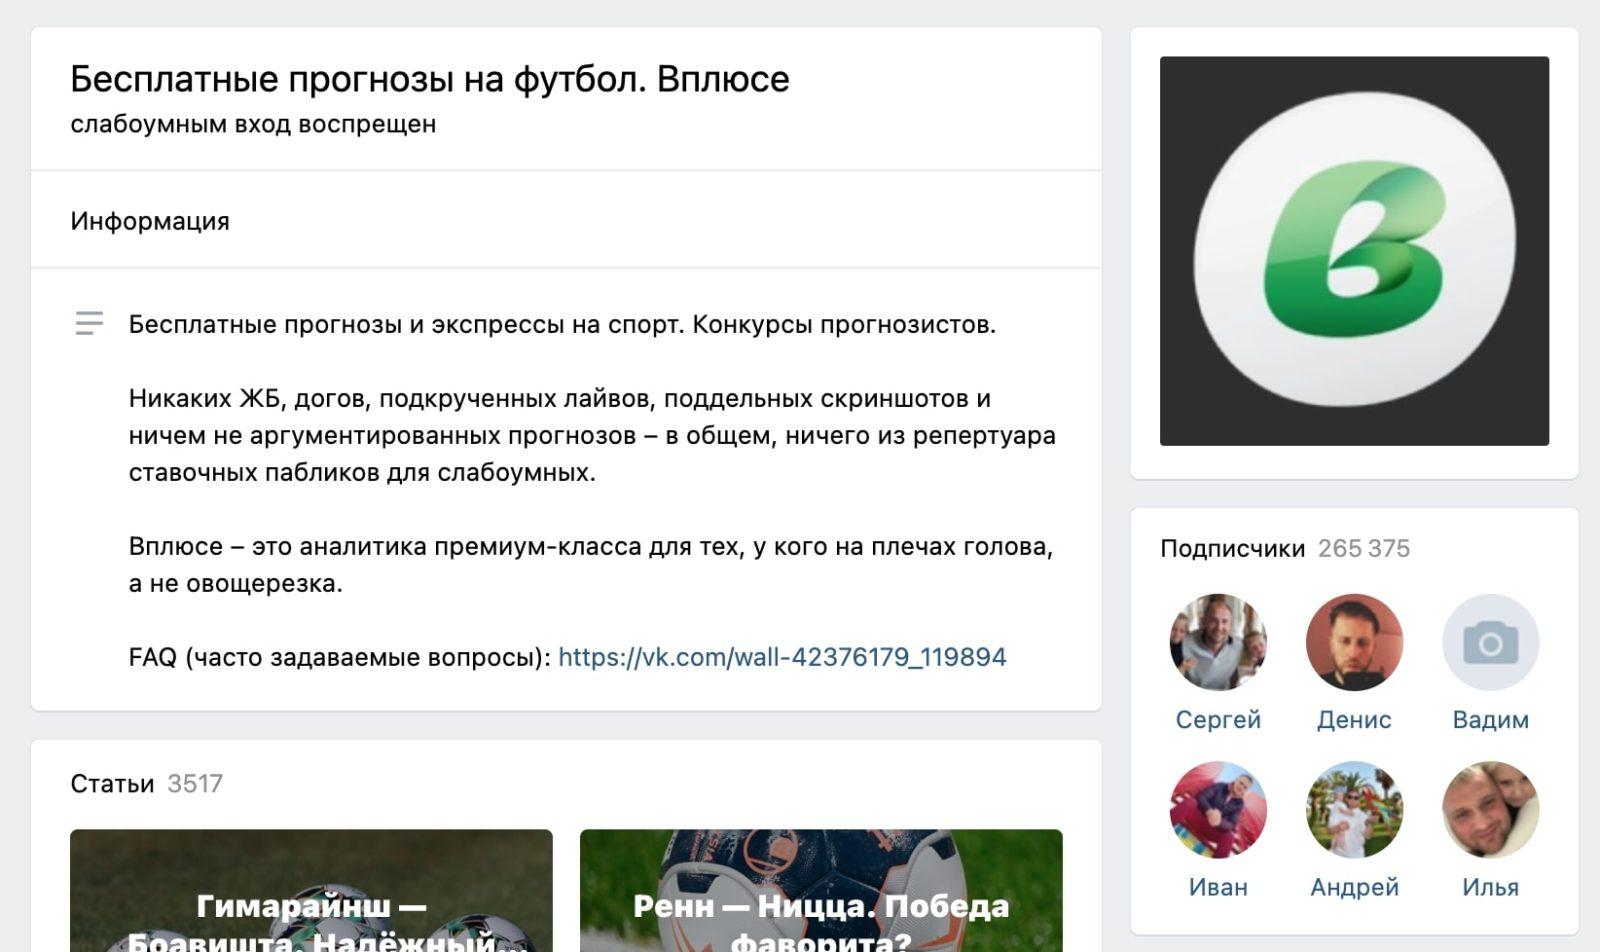 Группа ВК https Vpliuse ru (Вплюсе ру)